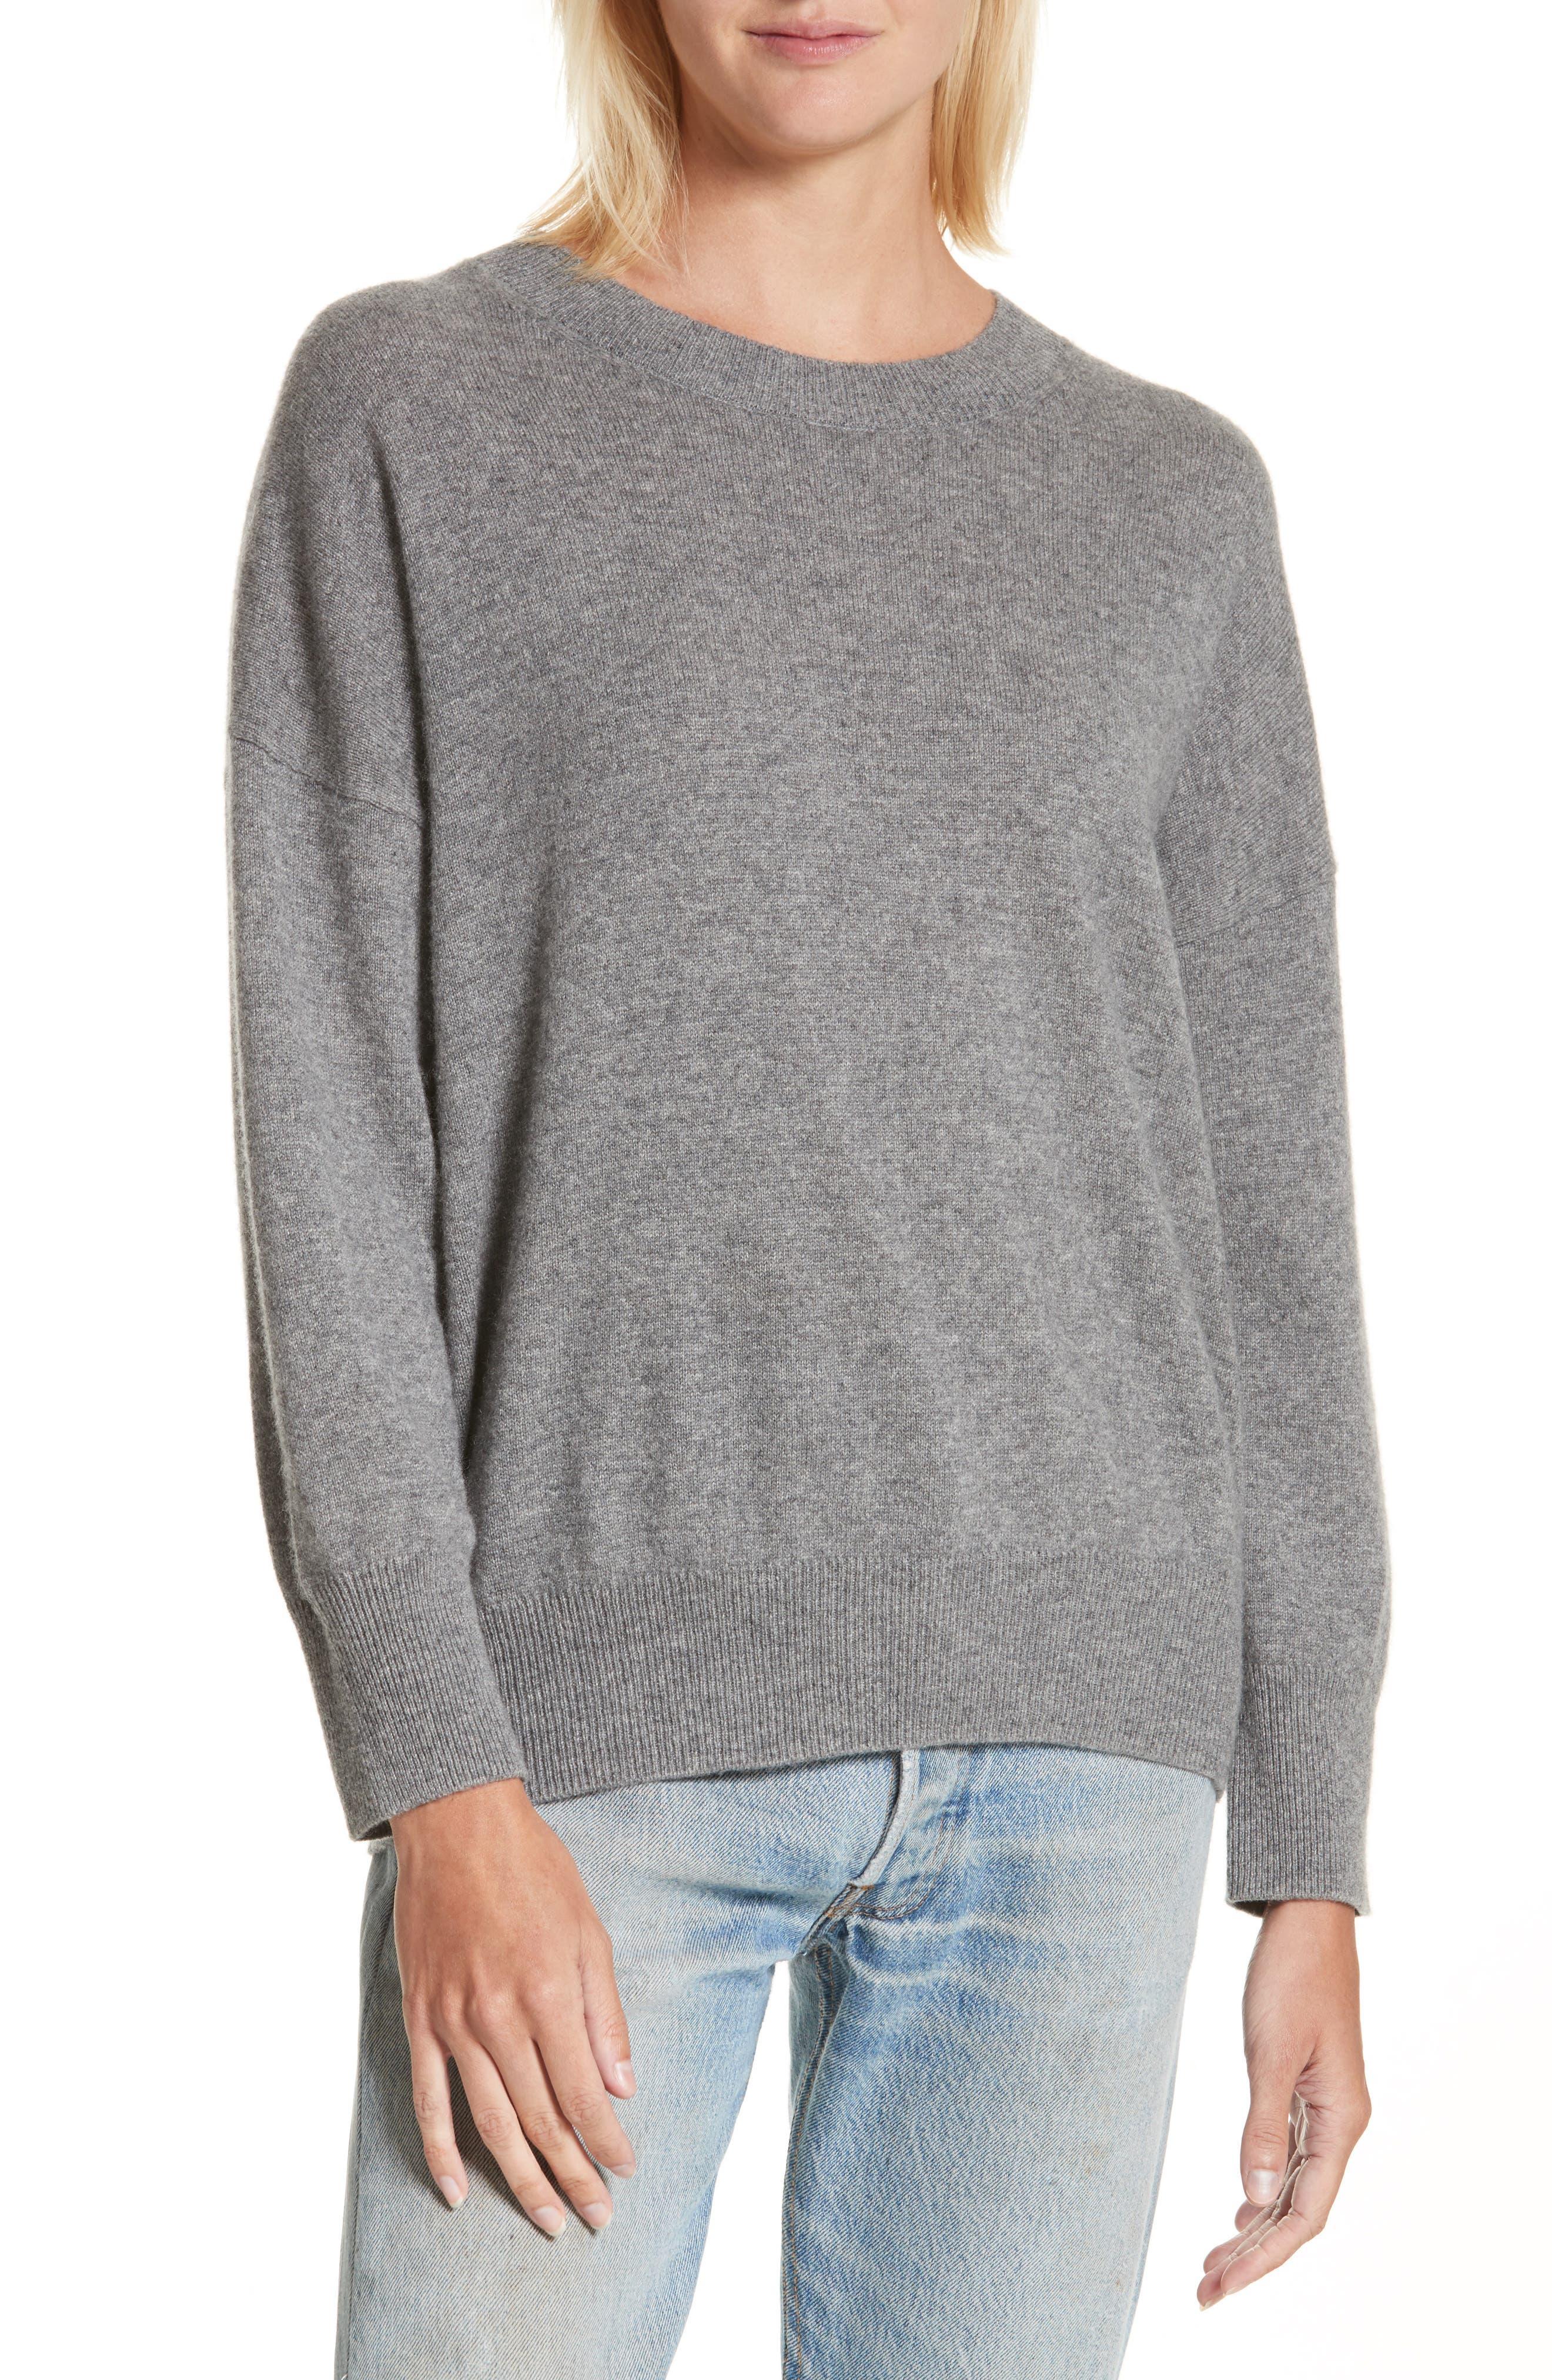 Alternate Image 1 Selected - Equipment Melanie Cashmere Sweater